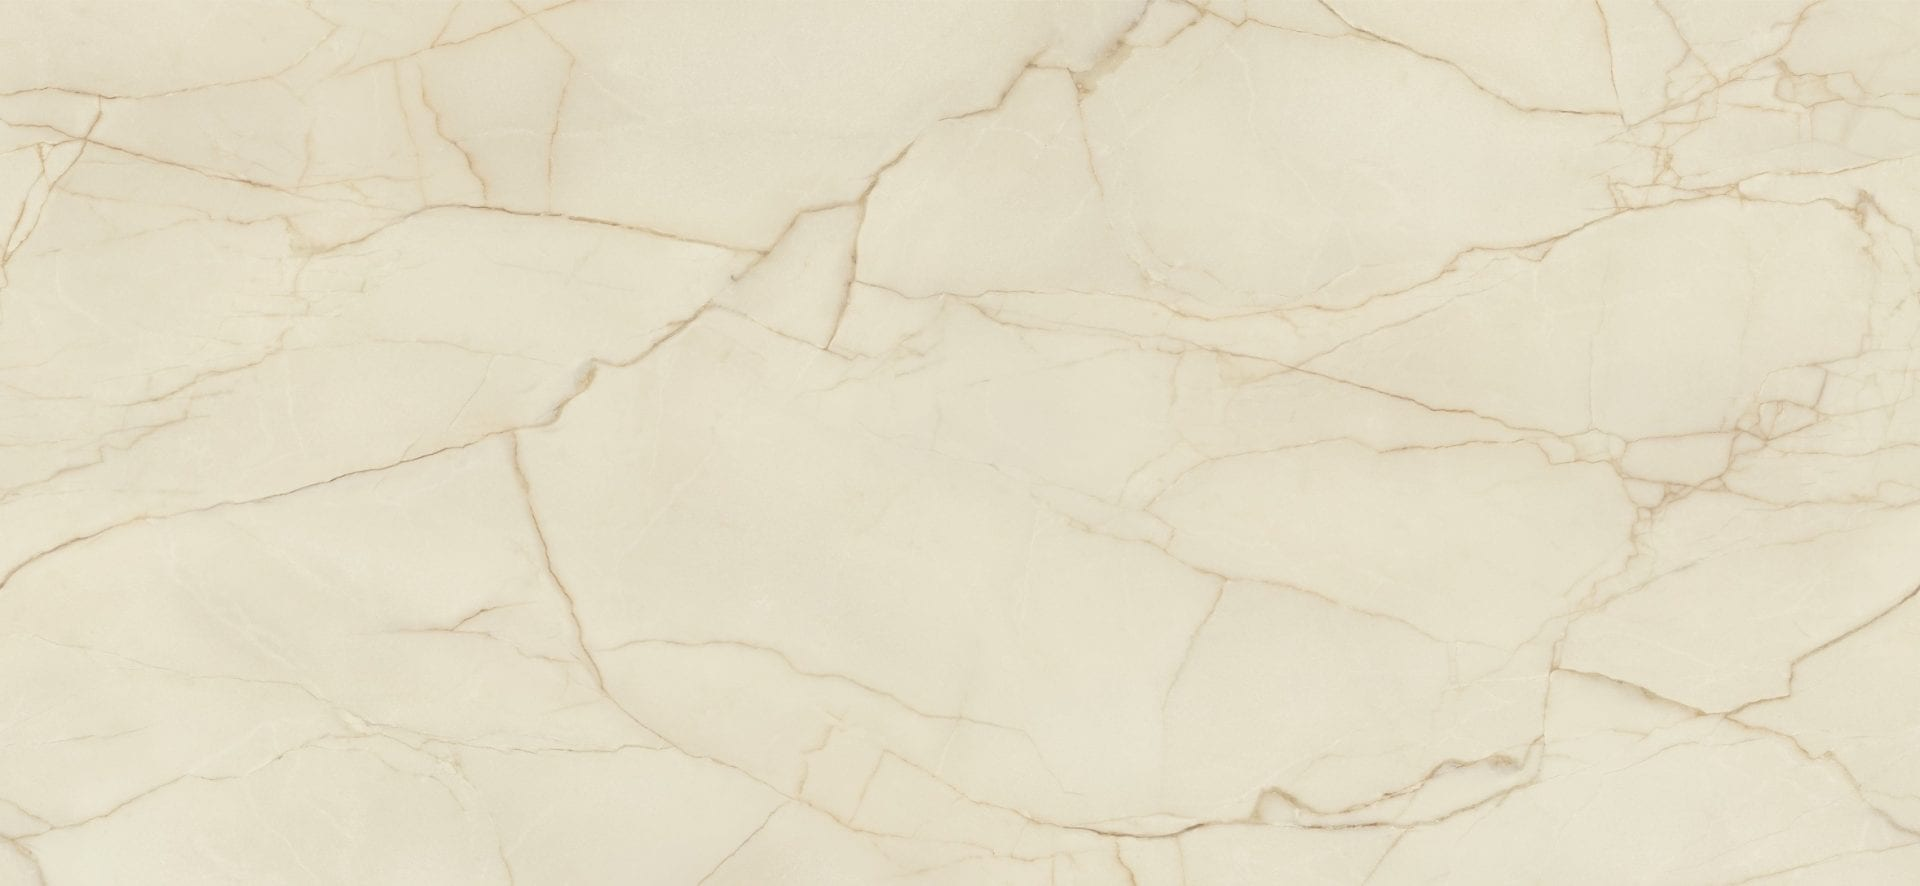 Burano Marble Full Sheet Laminate Worktop by Topform